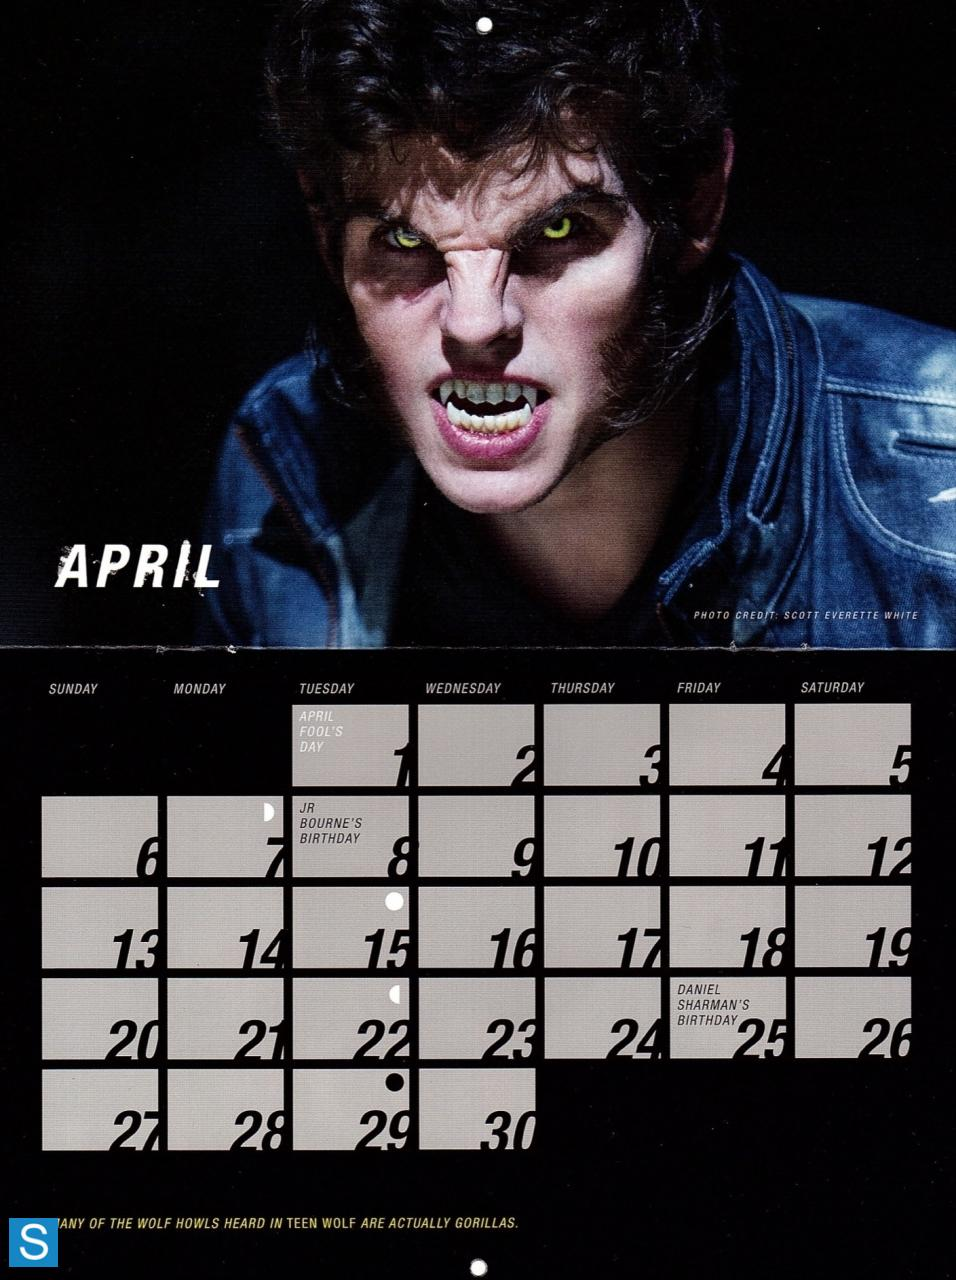 Teen Wolf - Season 3 - 2014 Calendar Promotional Photos